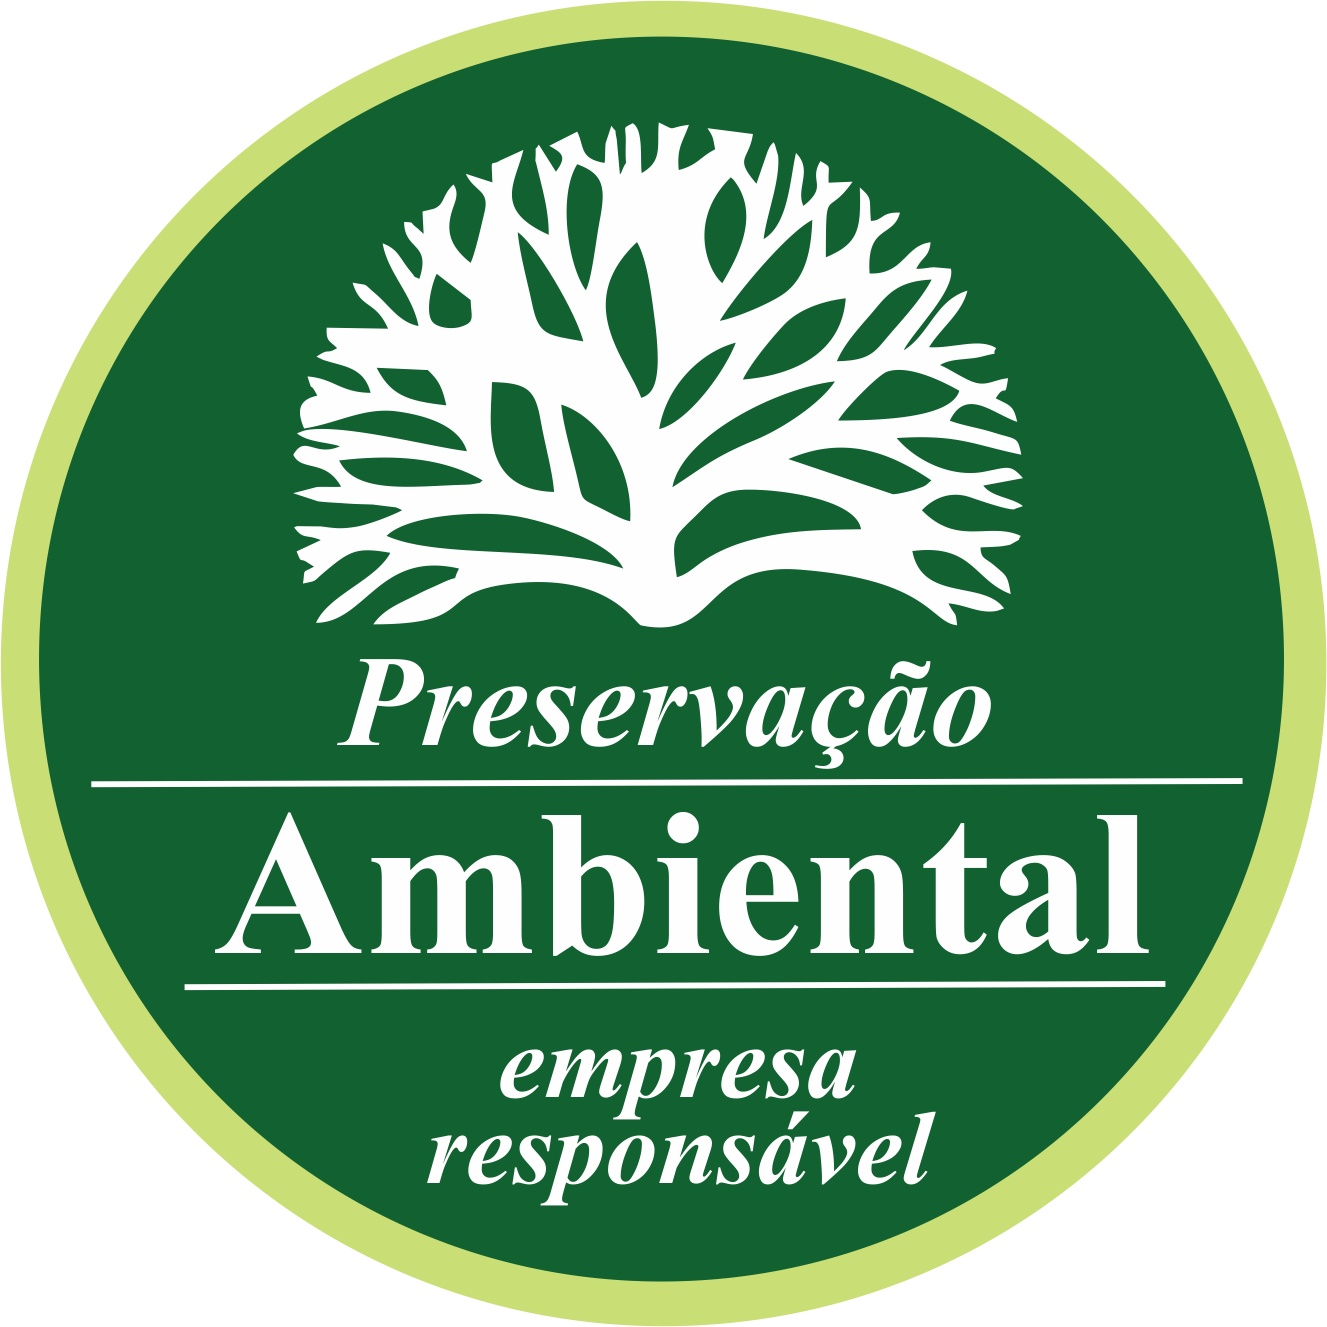 Perfume Aromatizante 500ml - Conforto (Go Eco Wash)  - Loja Go Eco Wash